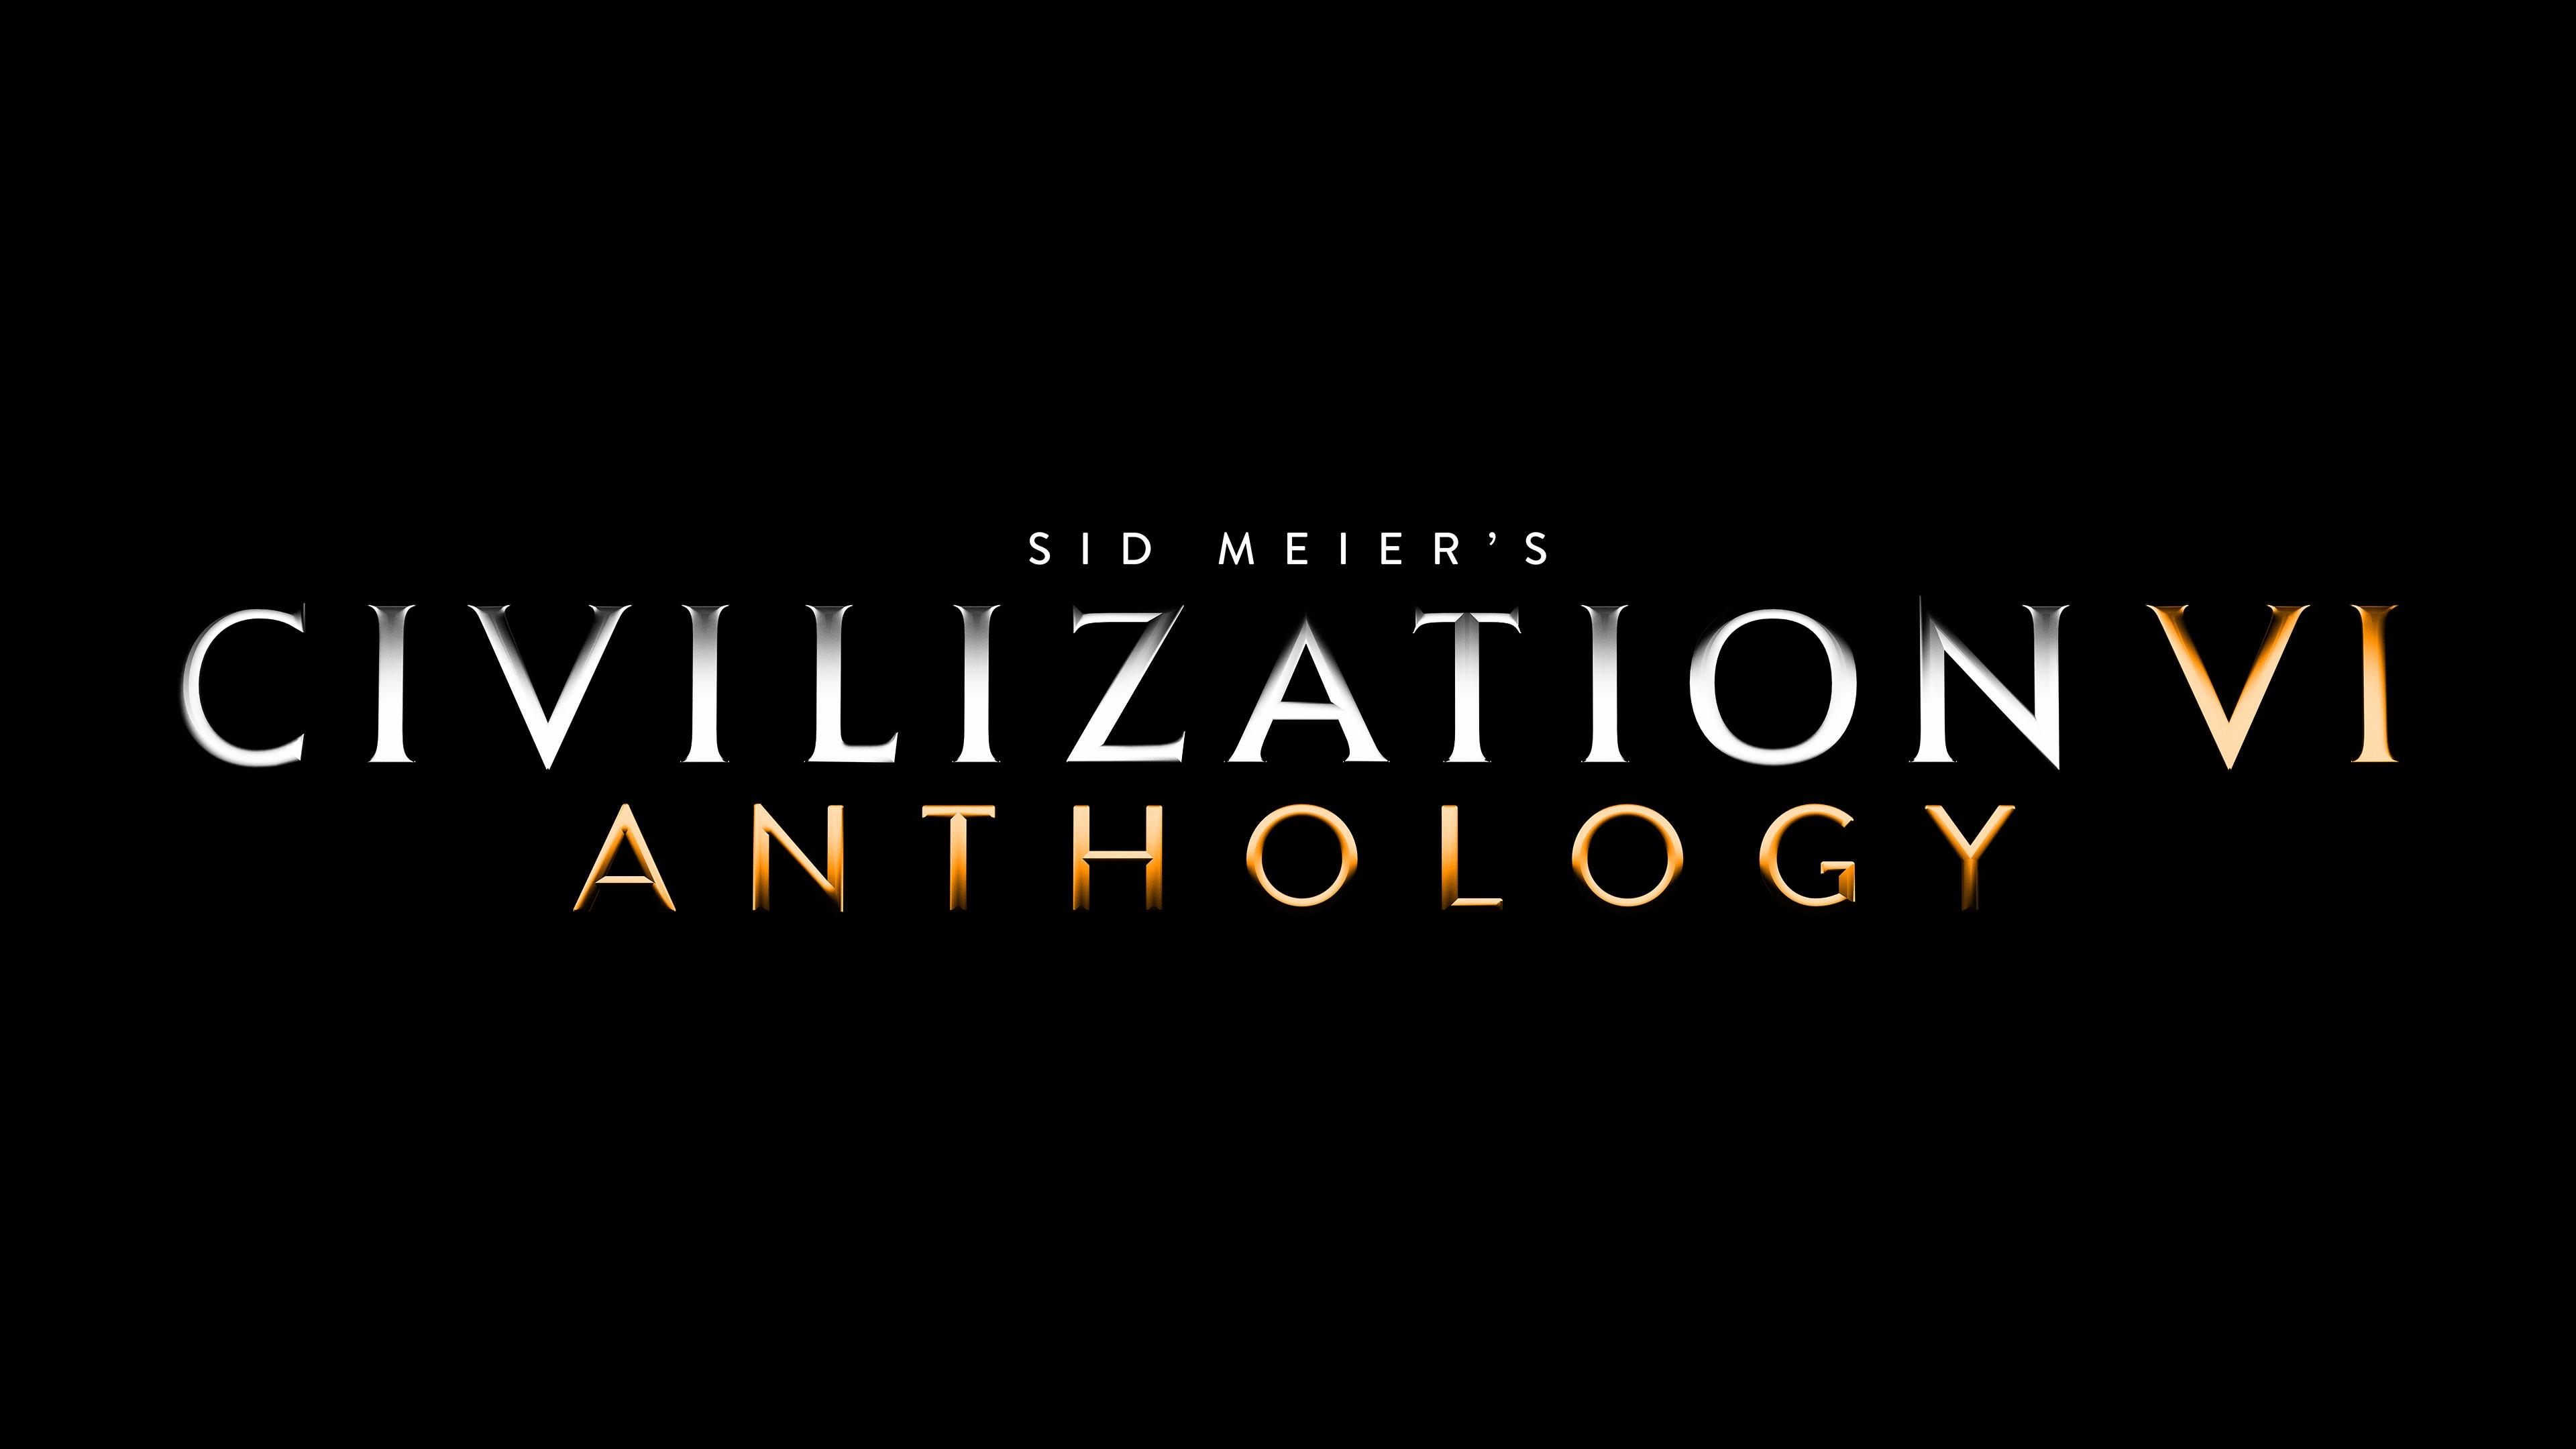 Sid Meier's Civilization® VI Anthology (Steam) | ROW (67ab8d45-0fd9-4668-ba12-04c63878a8ea)